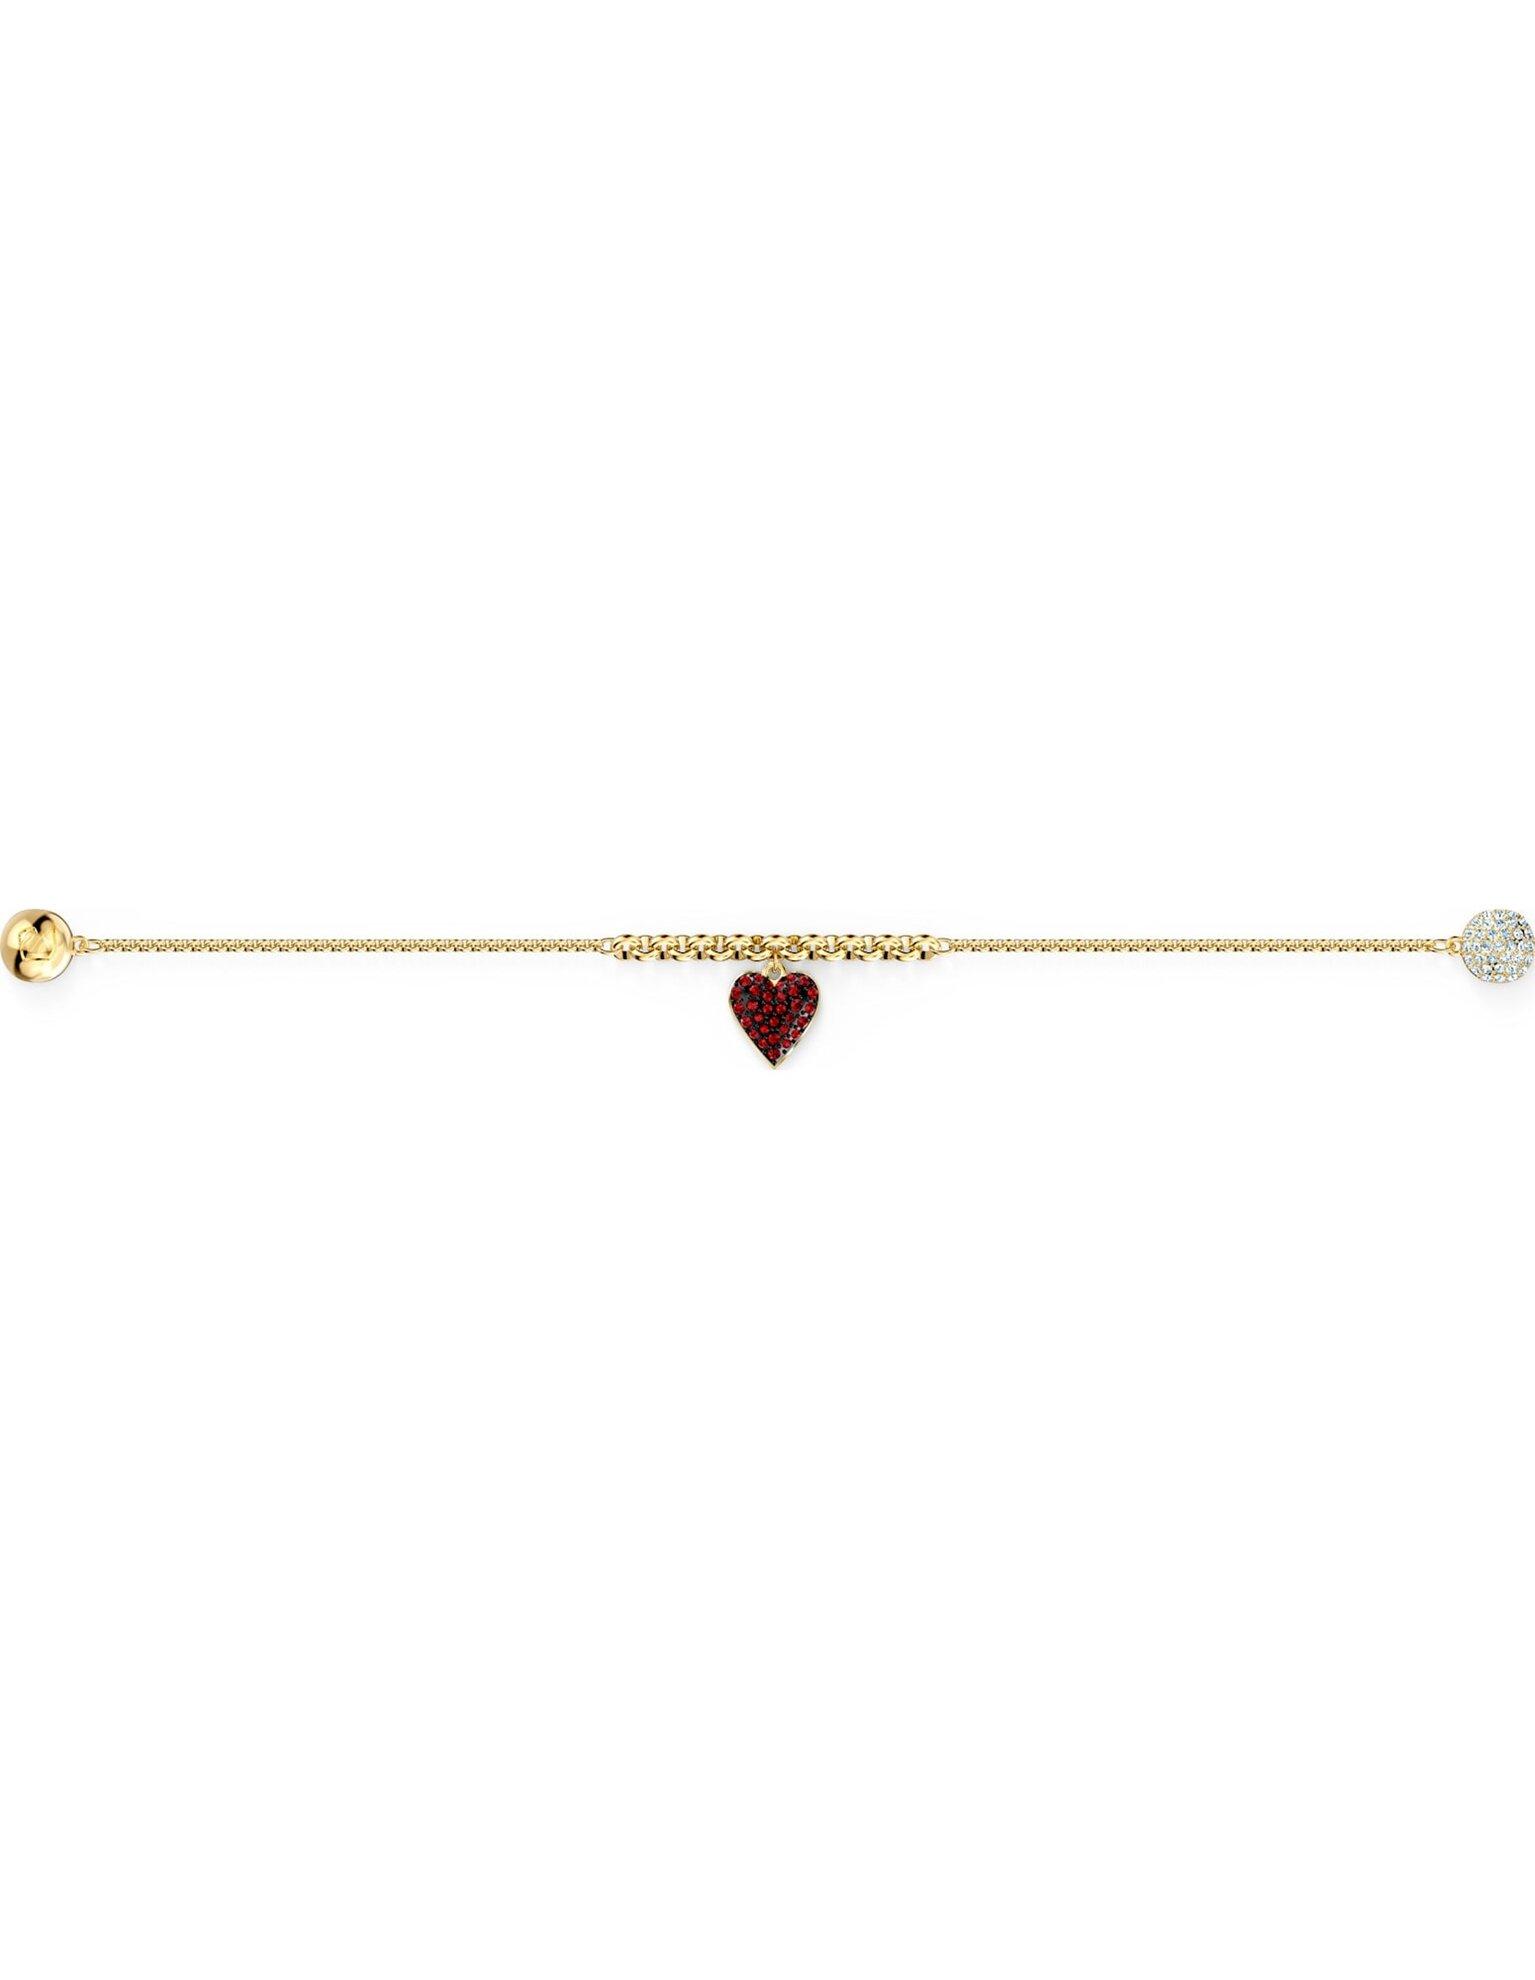 Picture of Swarovski Remix Collection Heart Strand, Kırmızı, Altın rengi kaplama